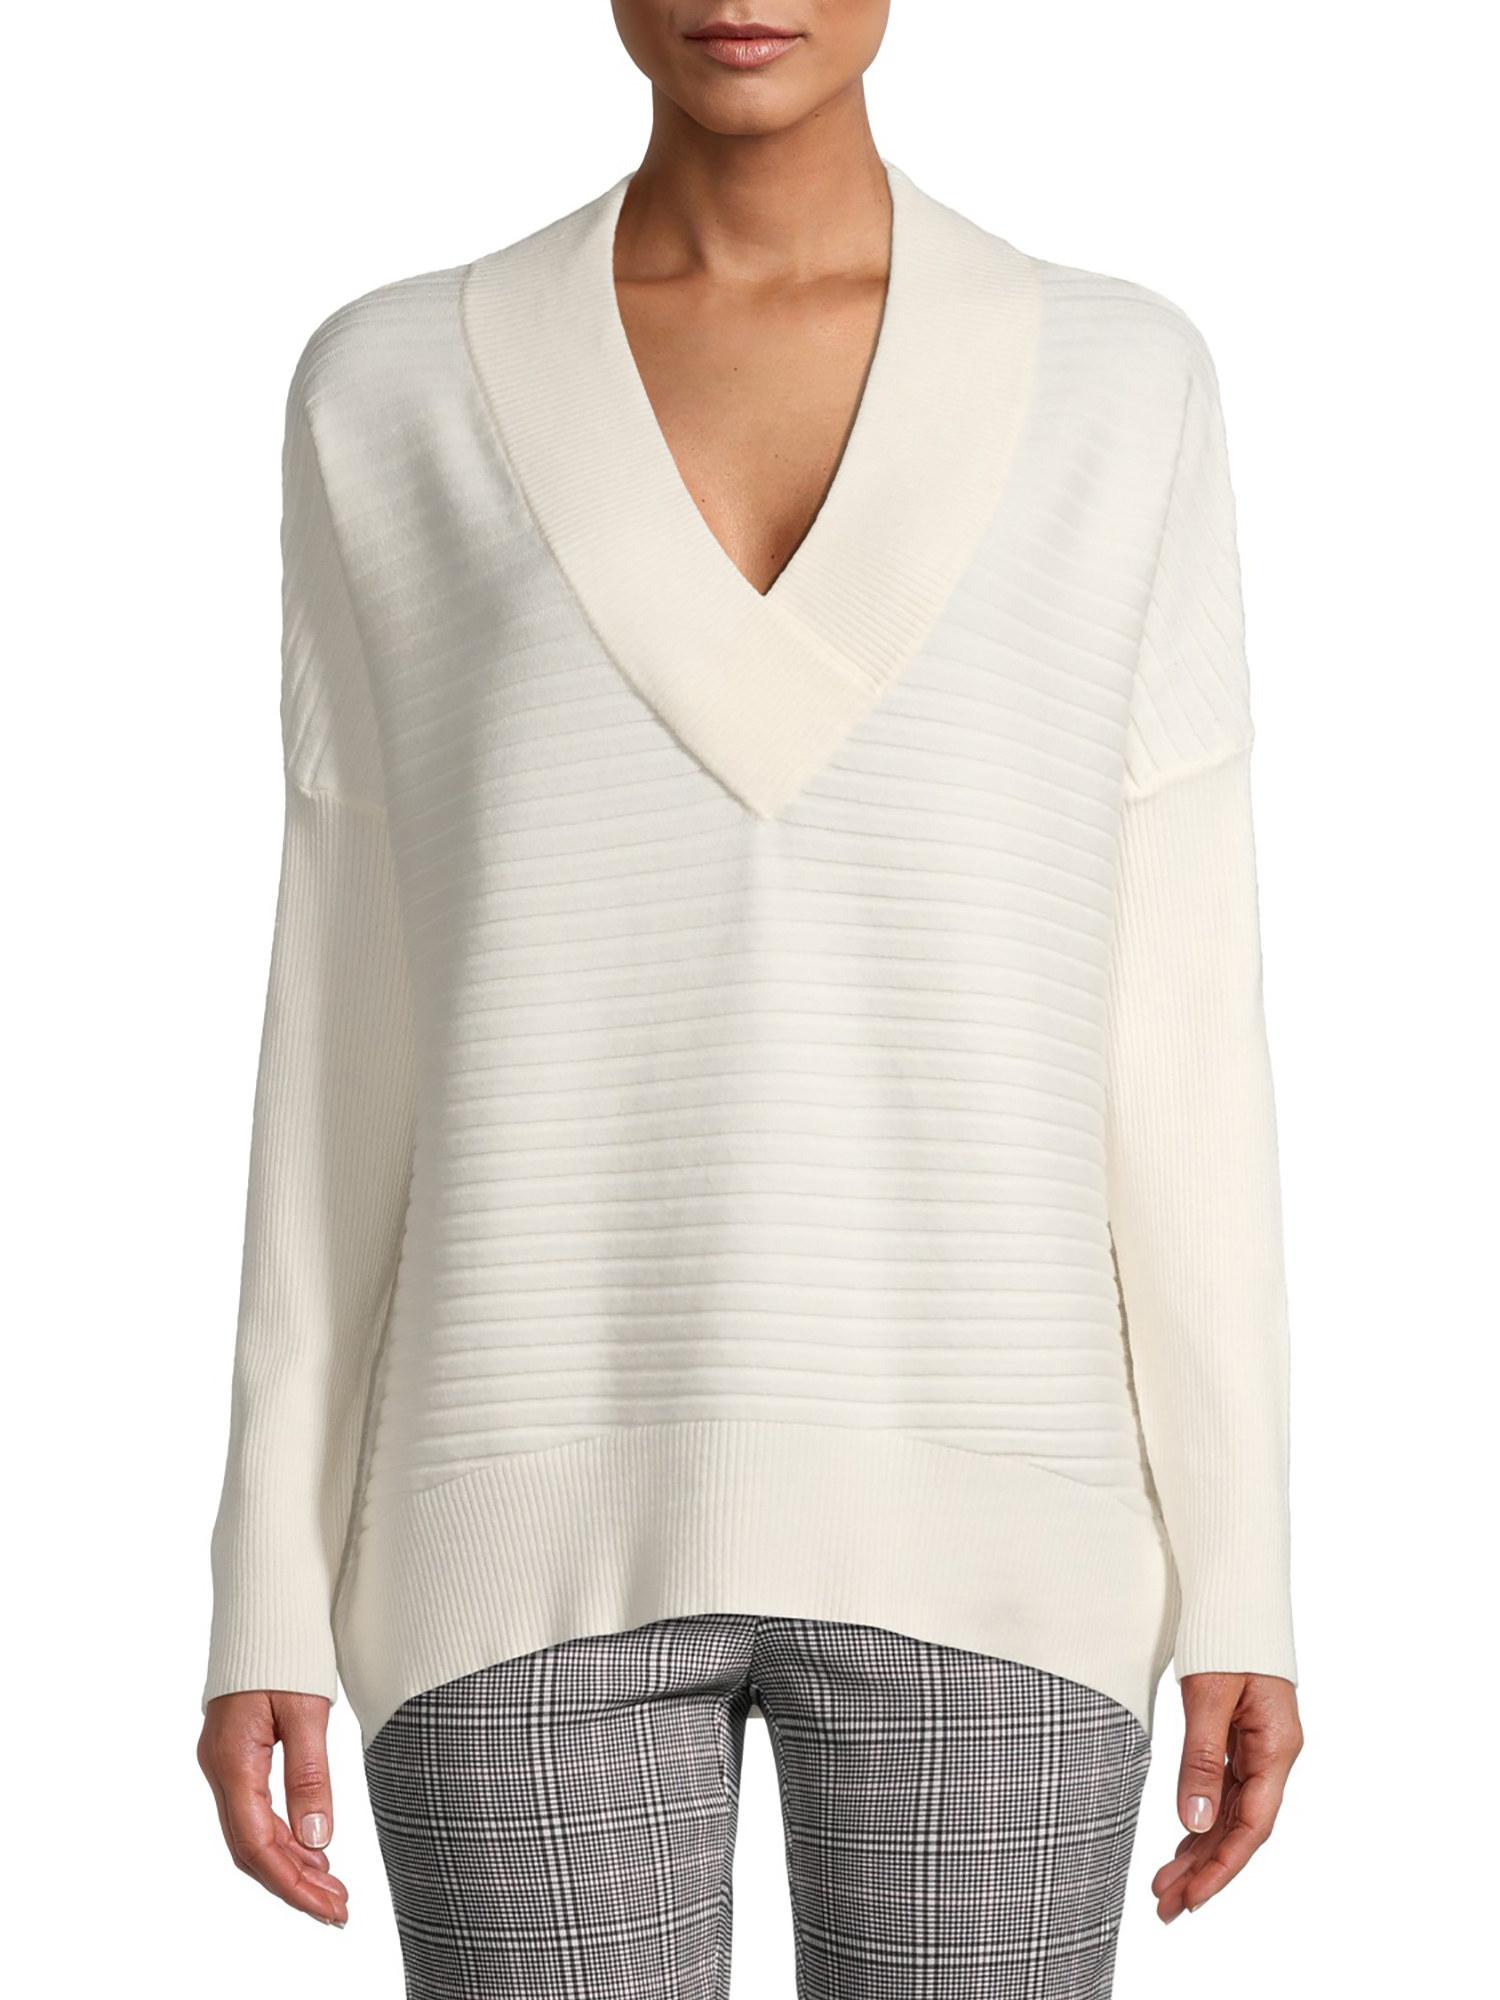 Model wearing cream v-neck pullover